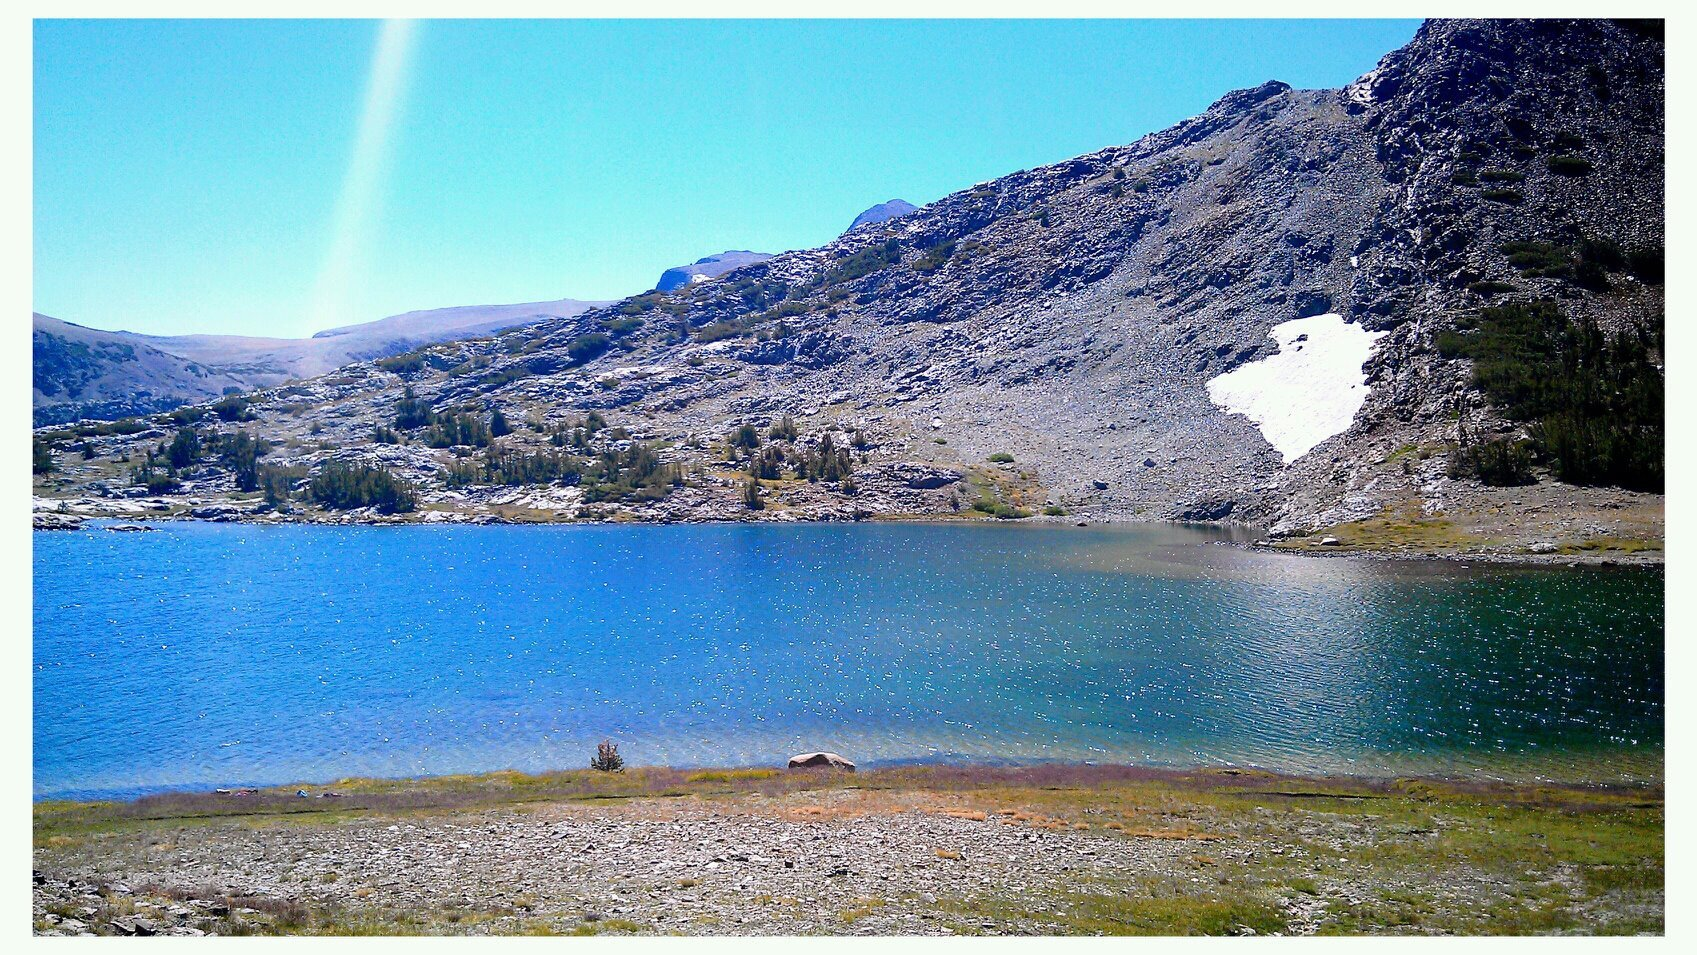 Upper Gaylor Lake, Yosemite NP